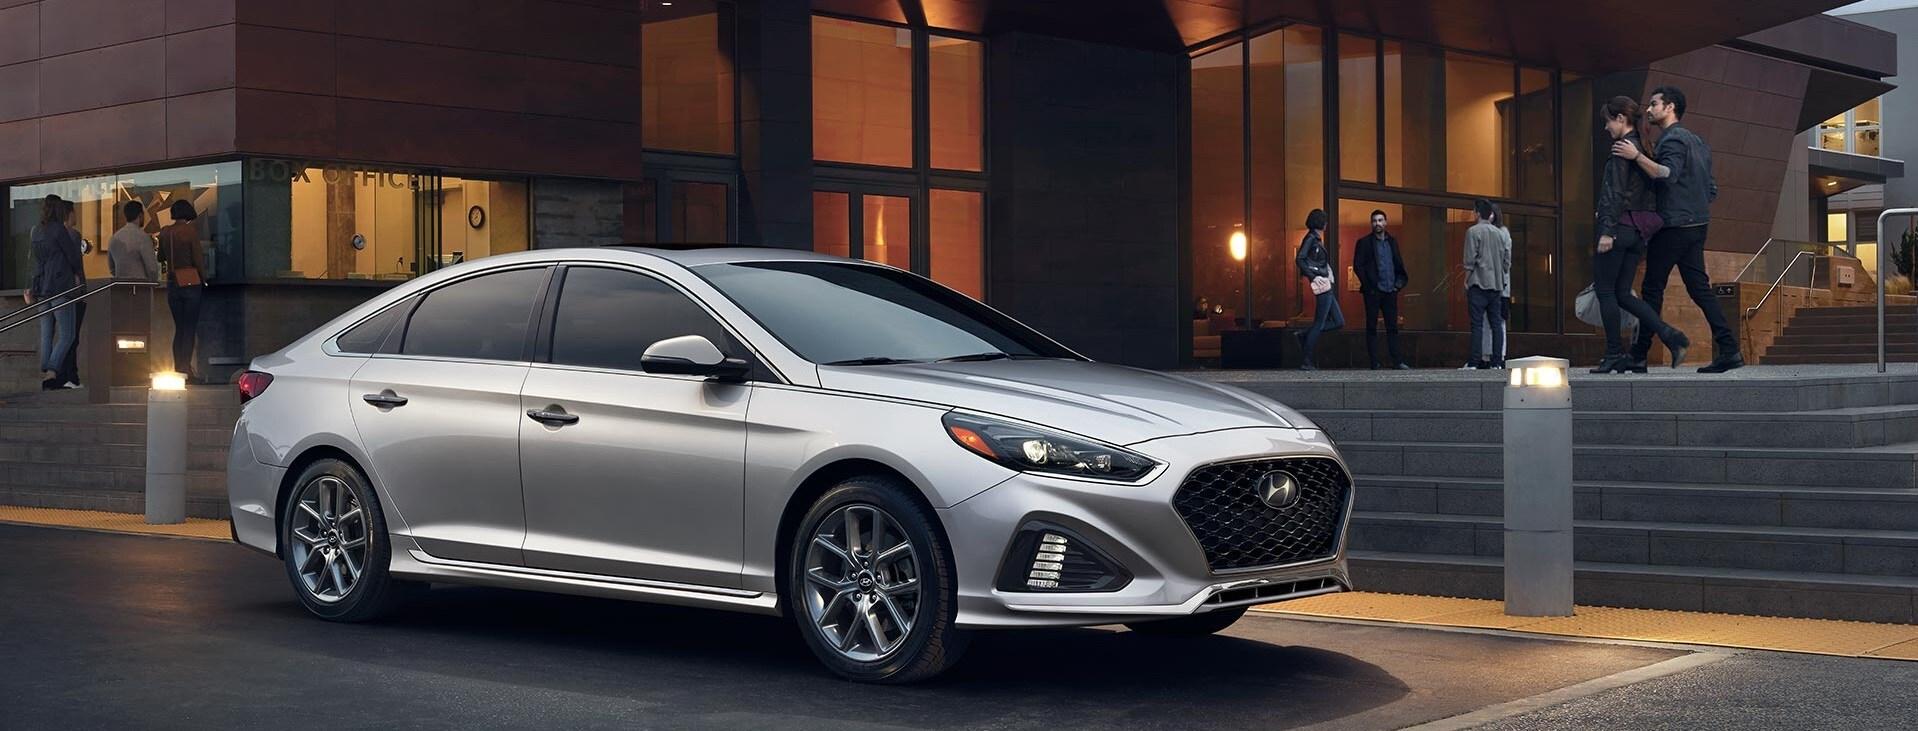 Perfect Find Luxury In A New 2018 Hyundai Sonata At Interstate Hyundai